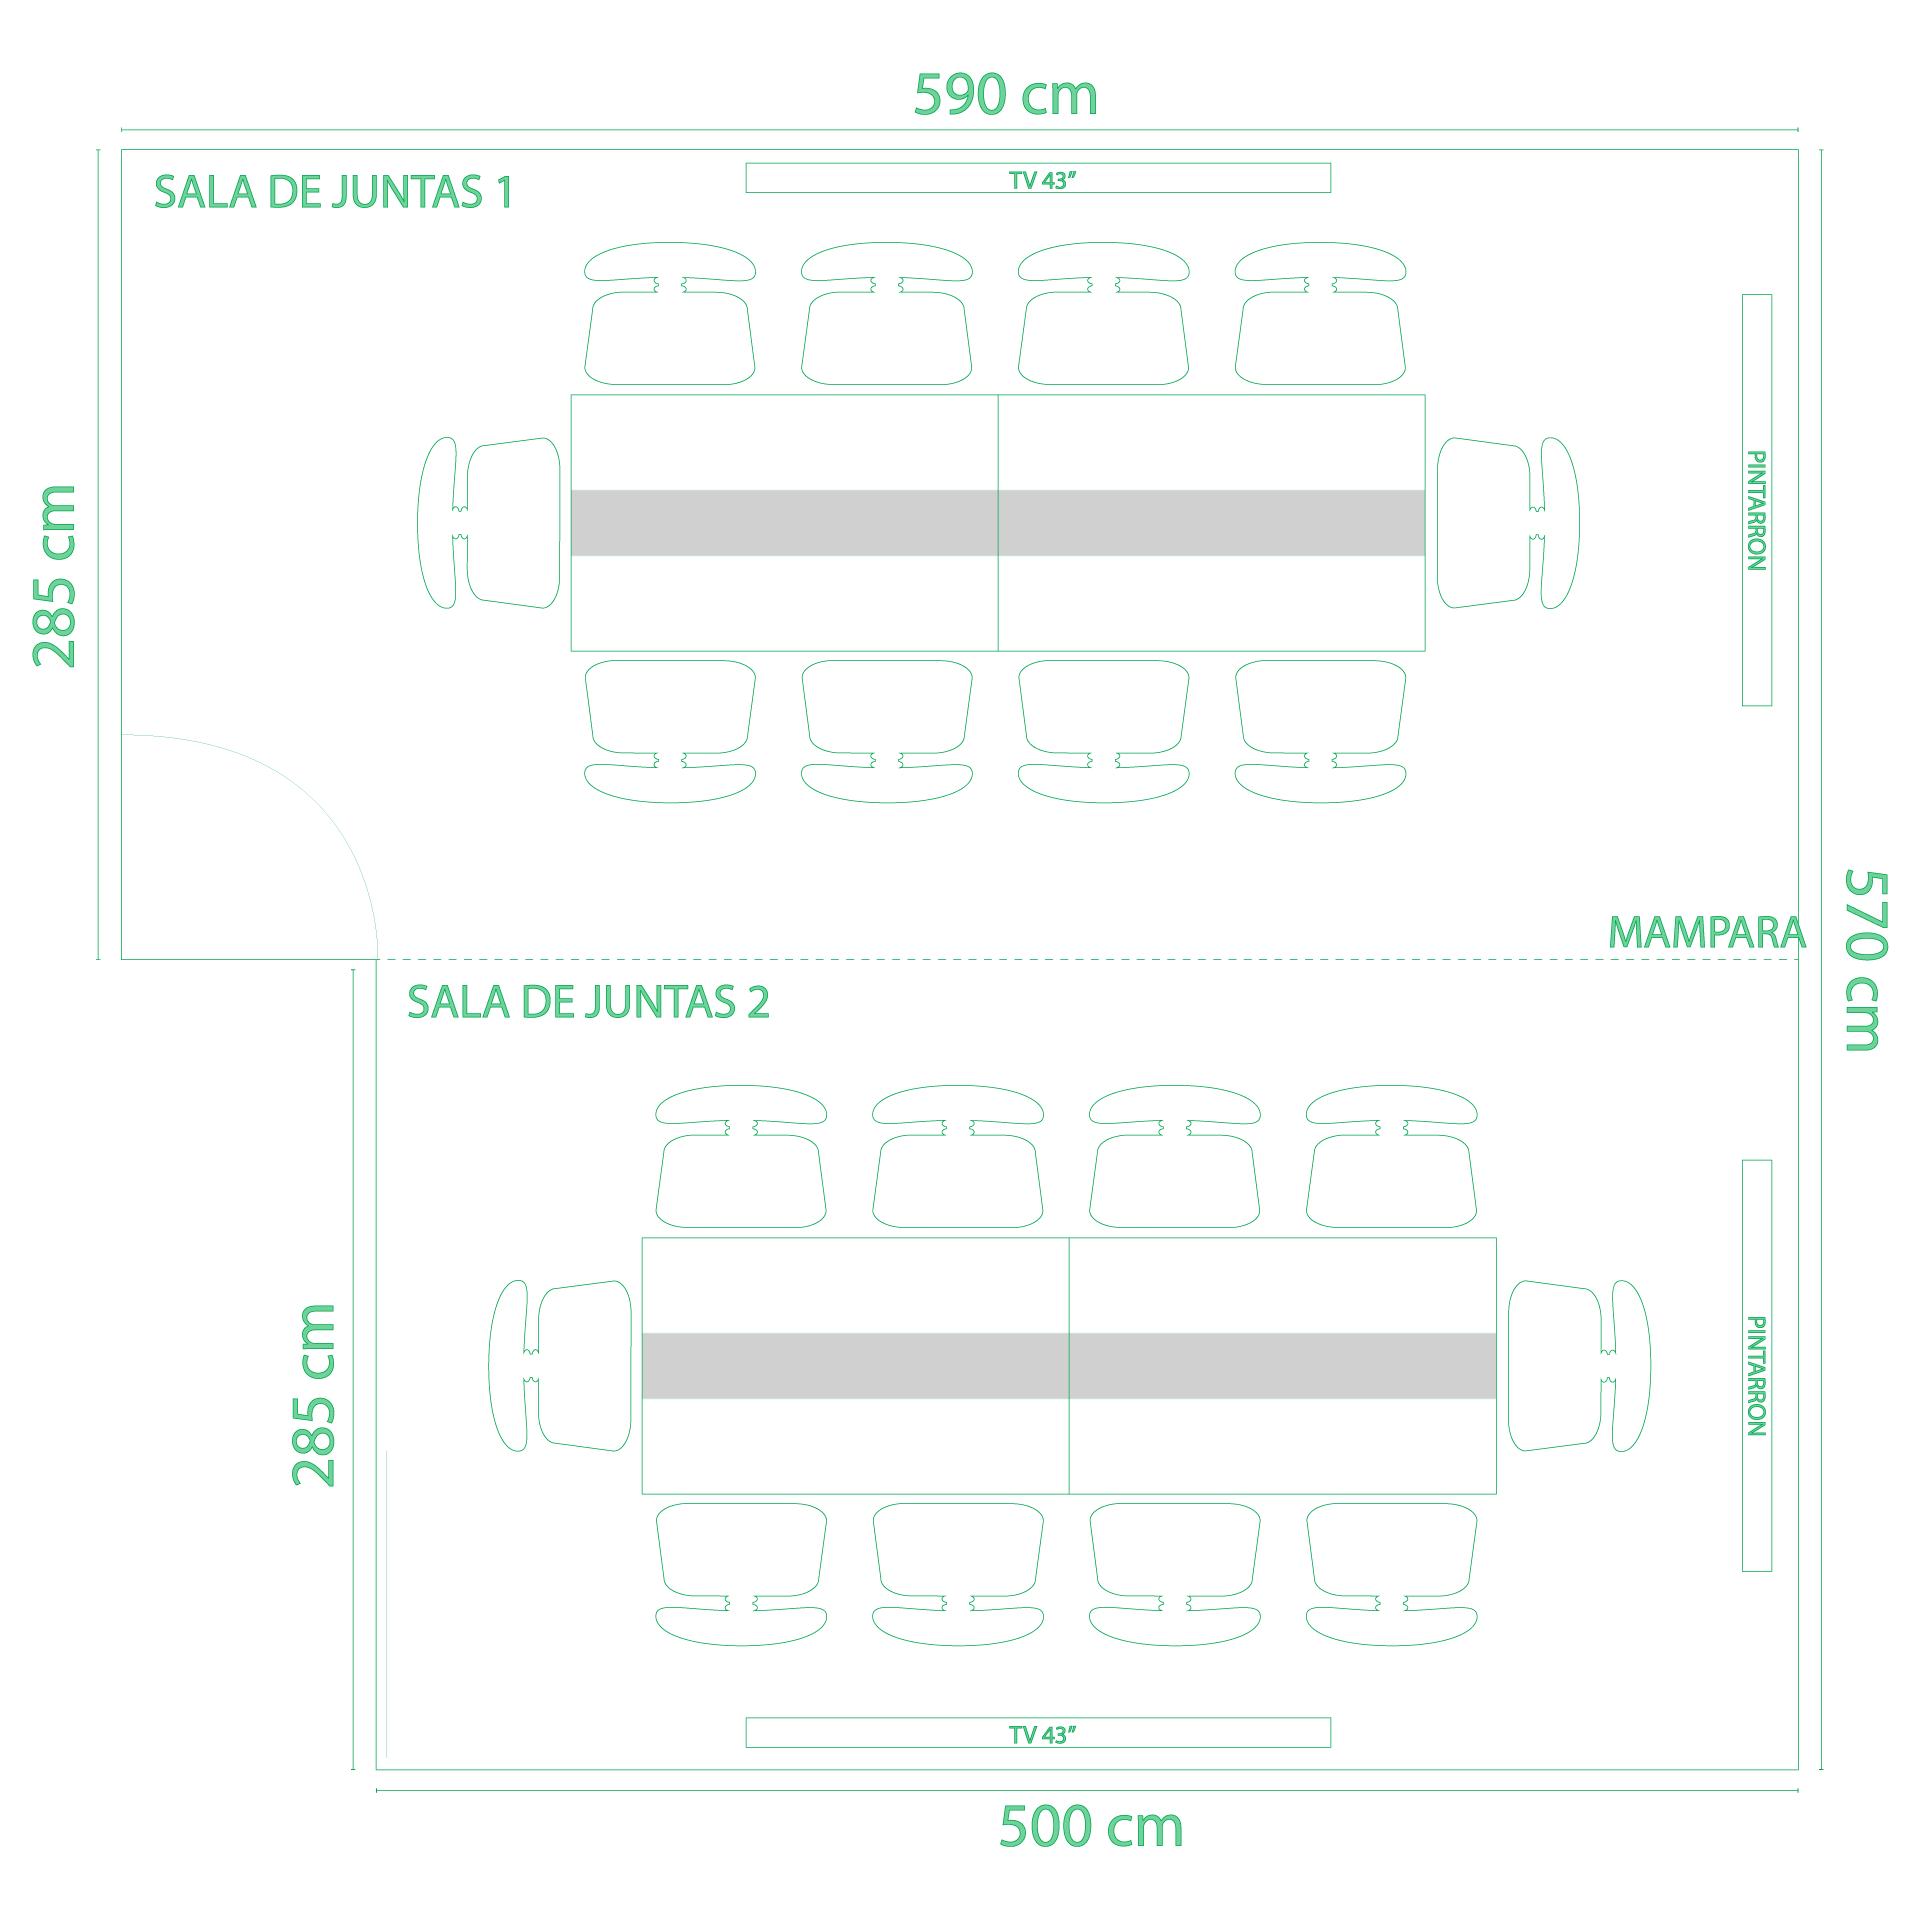 Mapa de Salas de Juntas